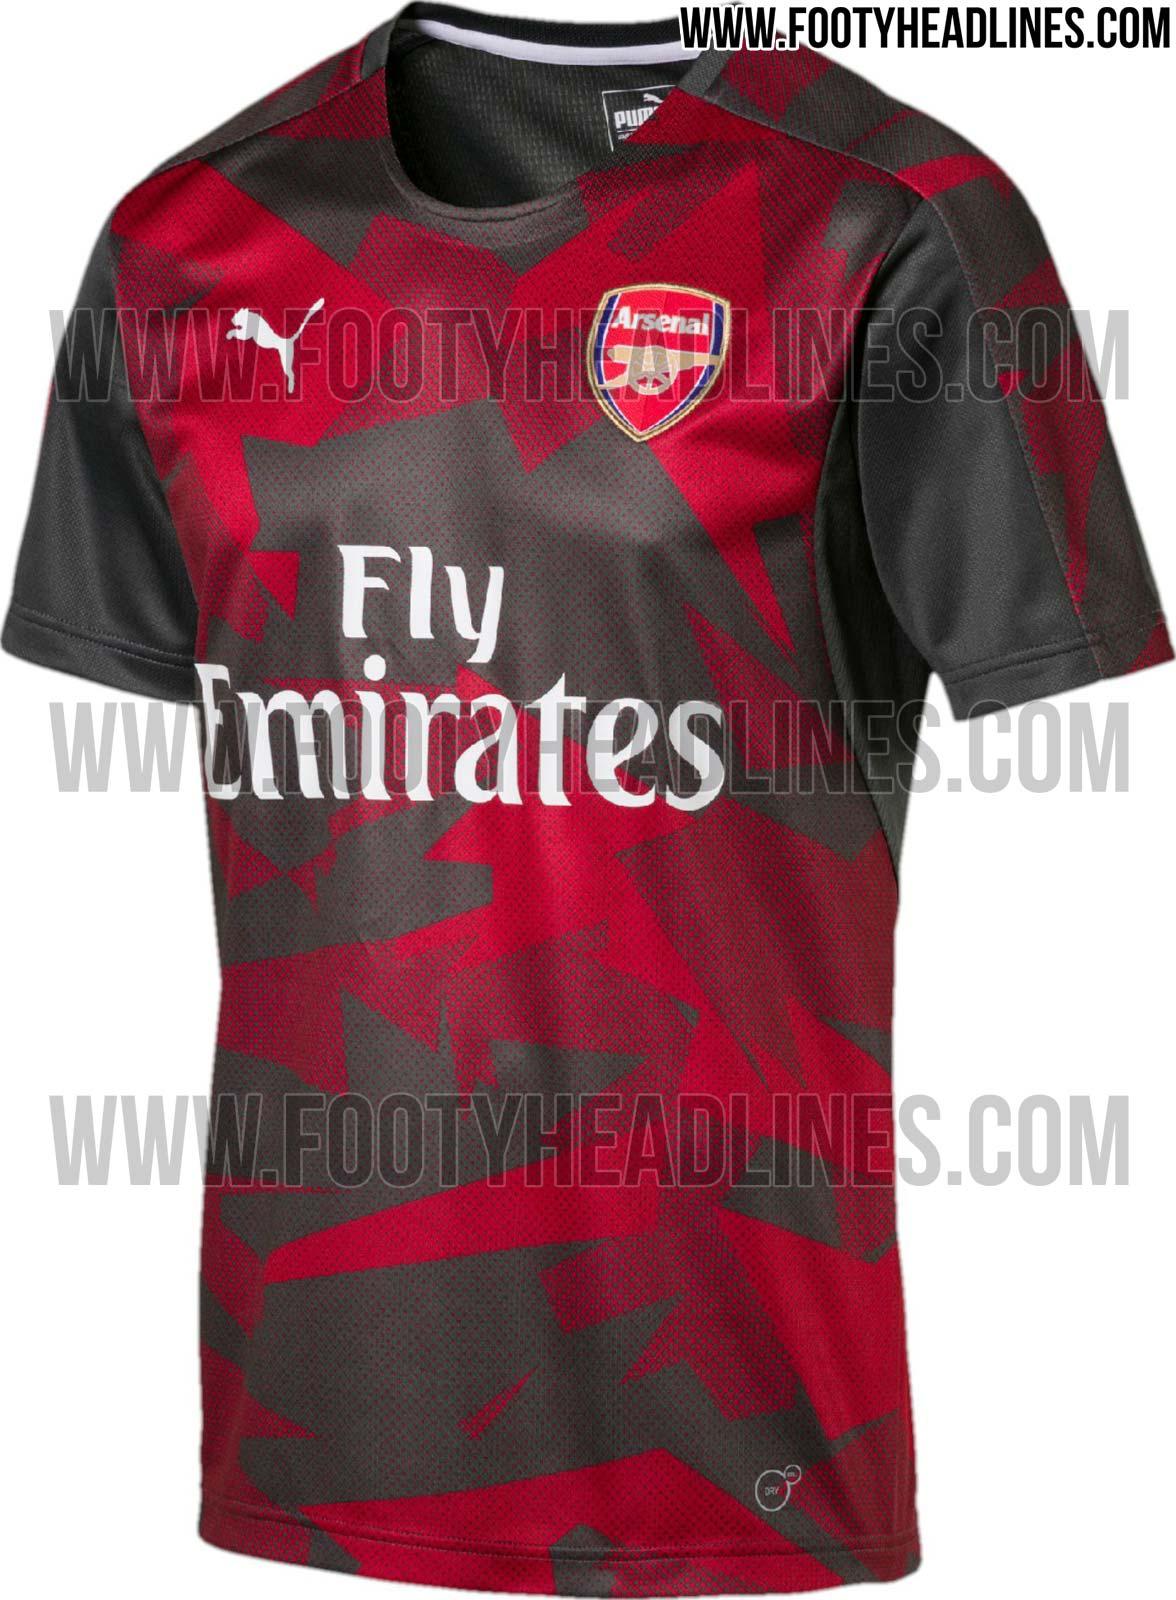 Arsenal 17-18 Pre-Match Shirt (Home)